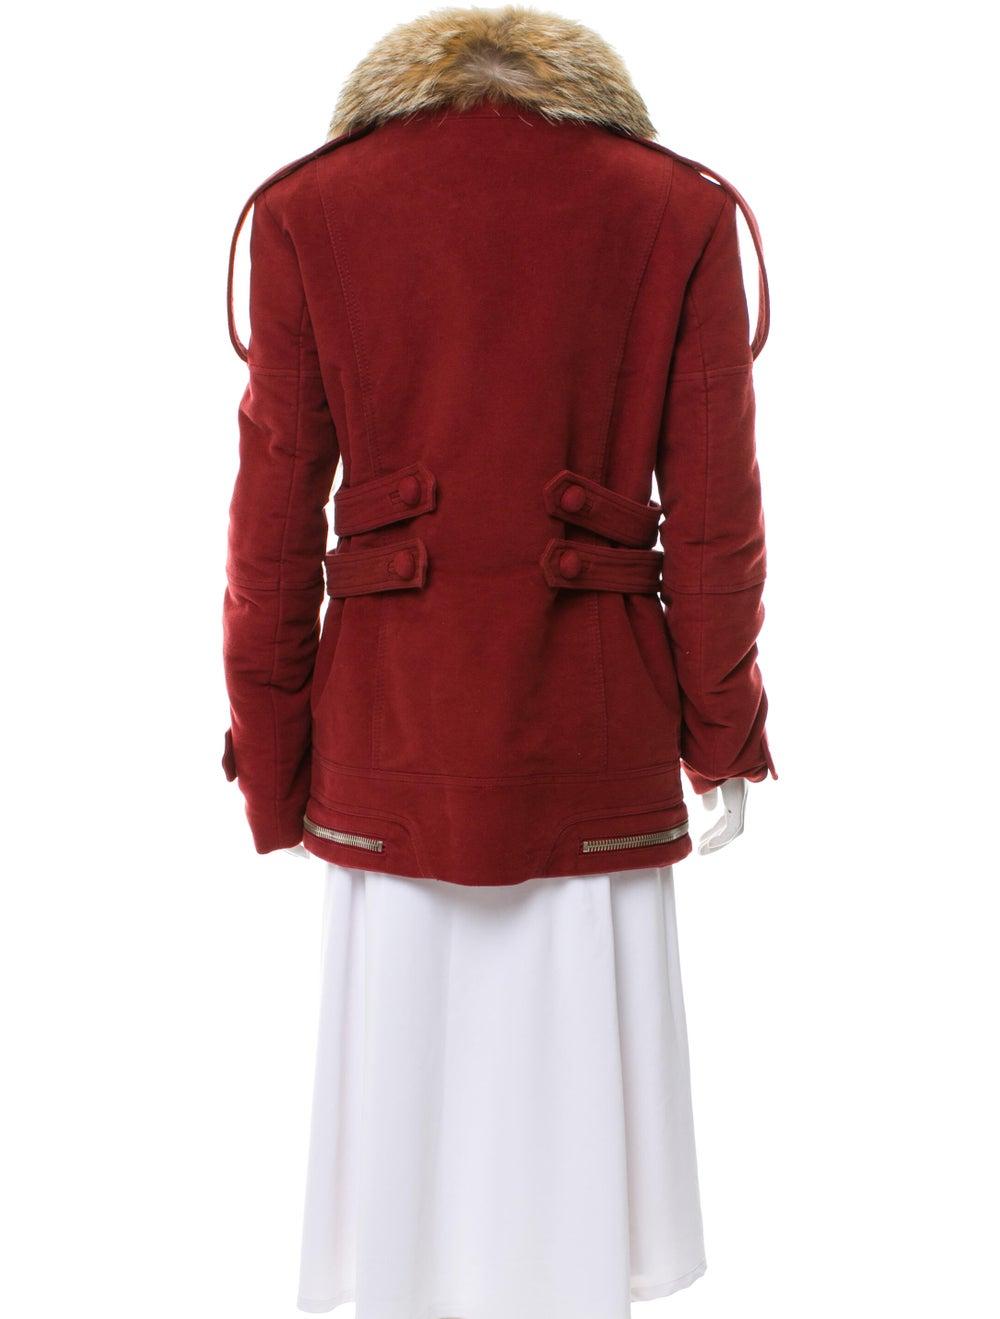 Altuzarra Jacket Red - image 3